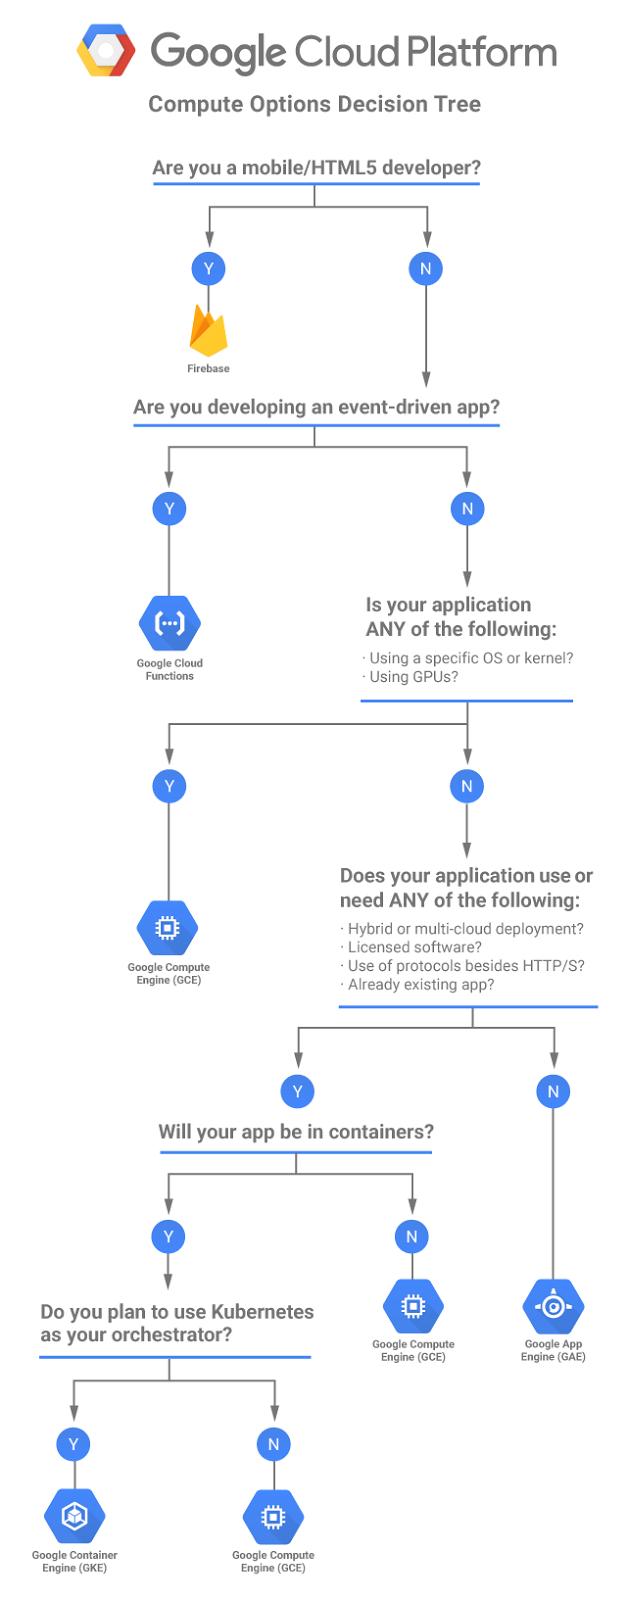 Welcome to Mat's Cloud: Google Cloud Platform (GCP) - How do